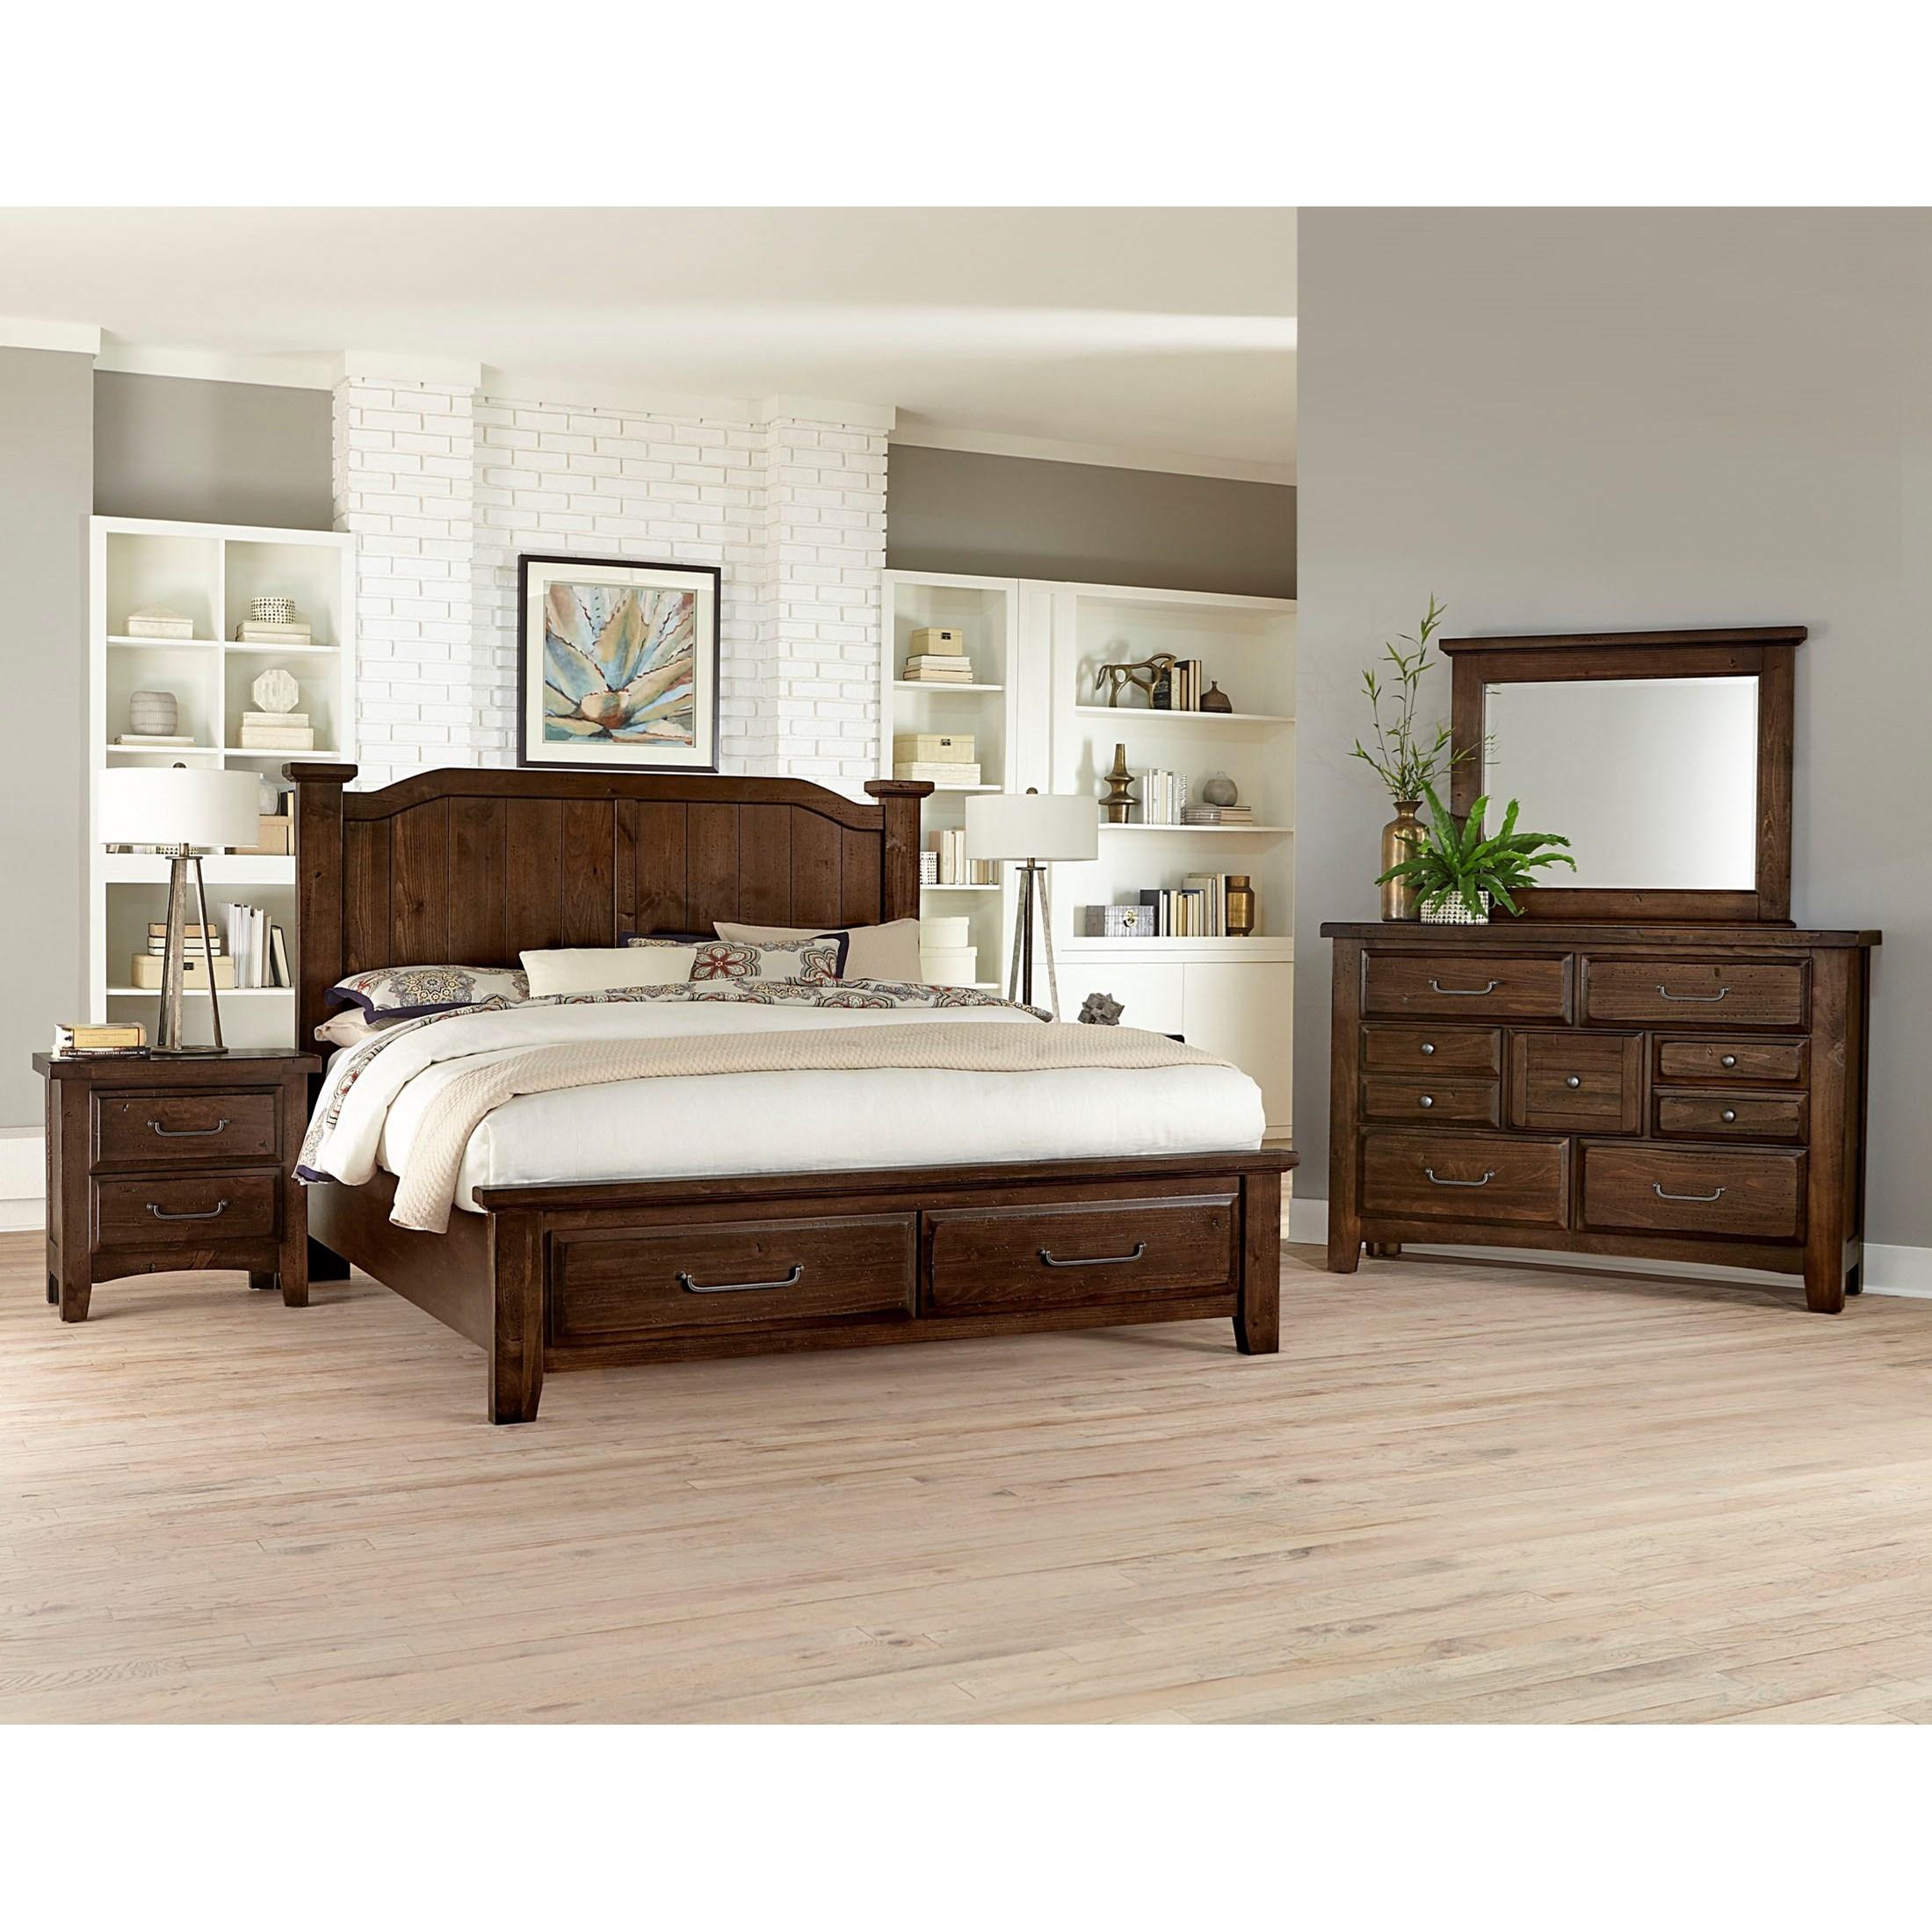 Sawmill Queen Bedroom Group by Vaughan Bassett at Northeast Factory Direct